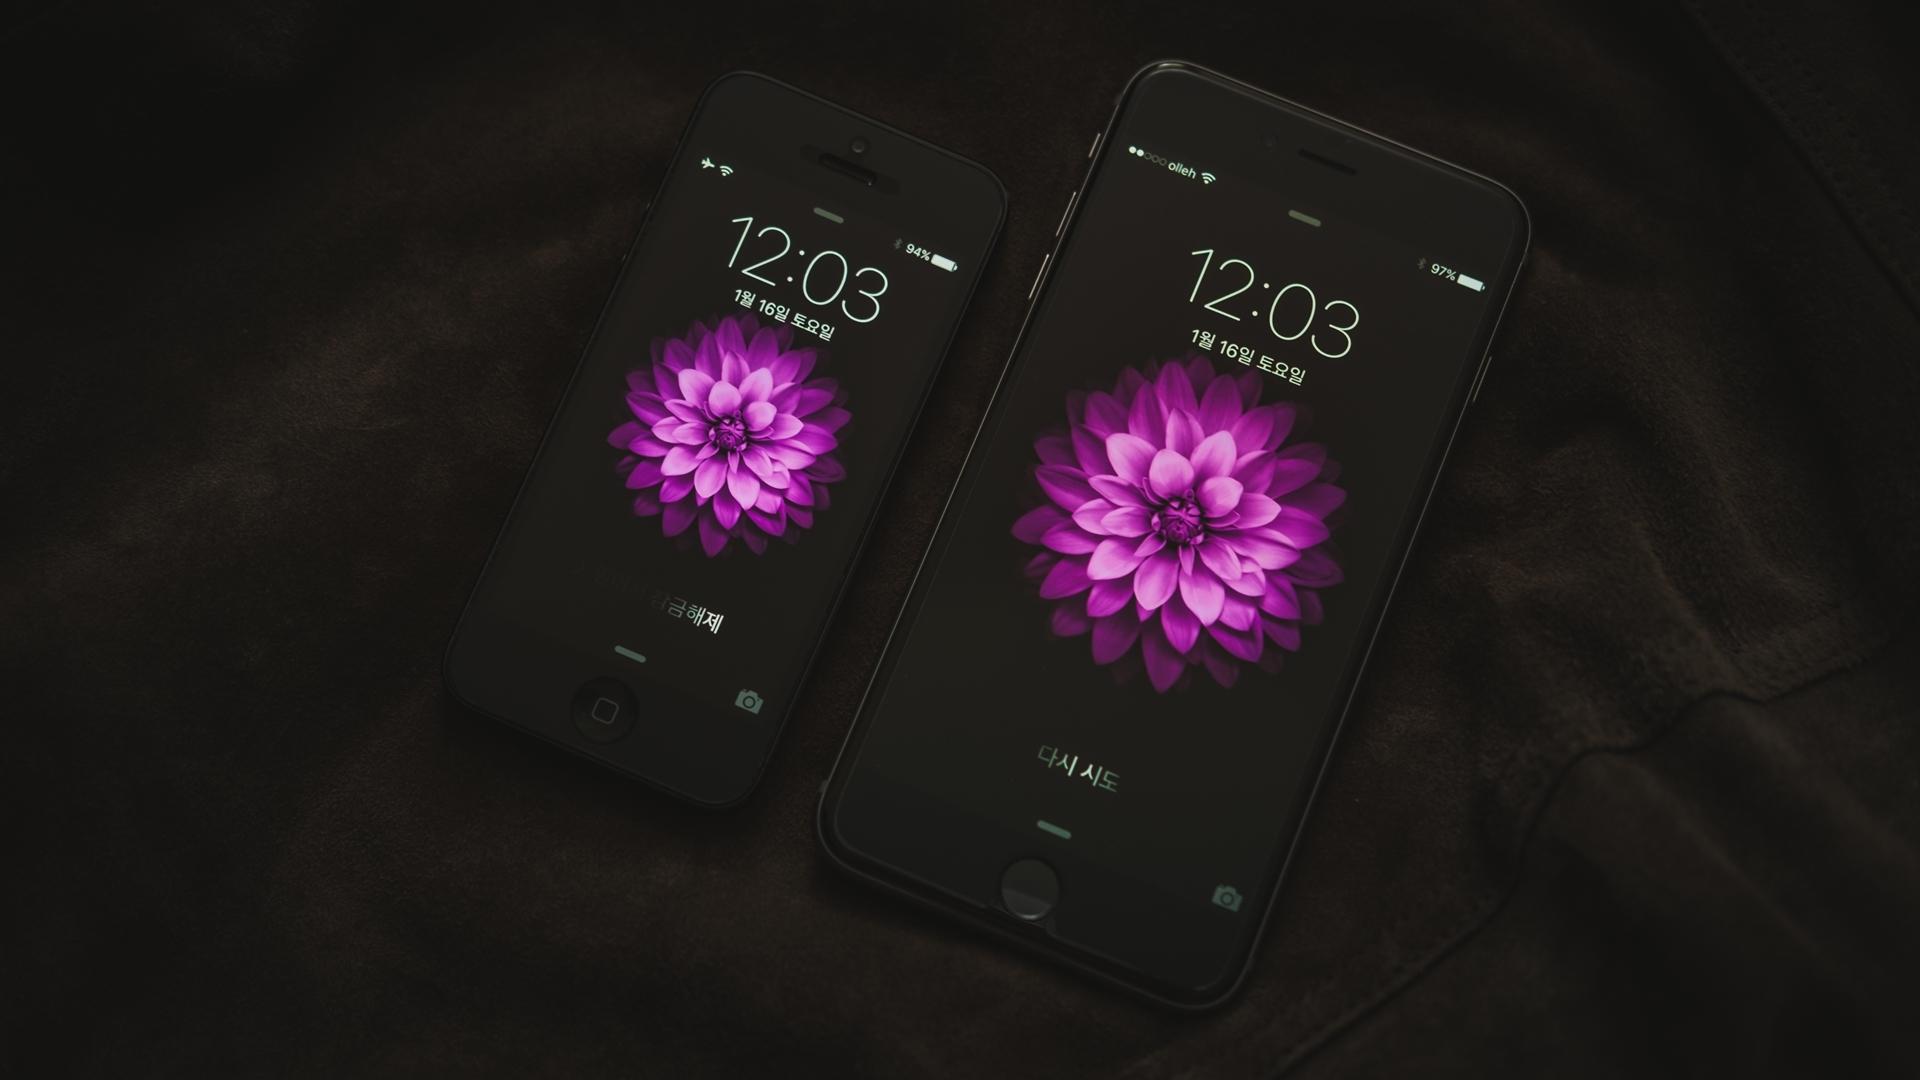 Wallpaper Black Purple Iphone 6 Electronics Color